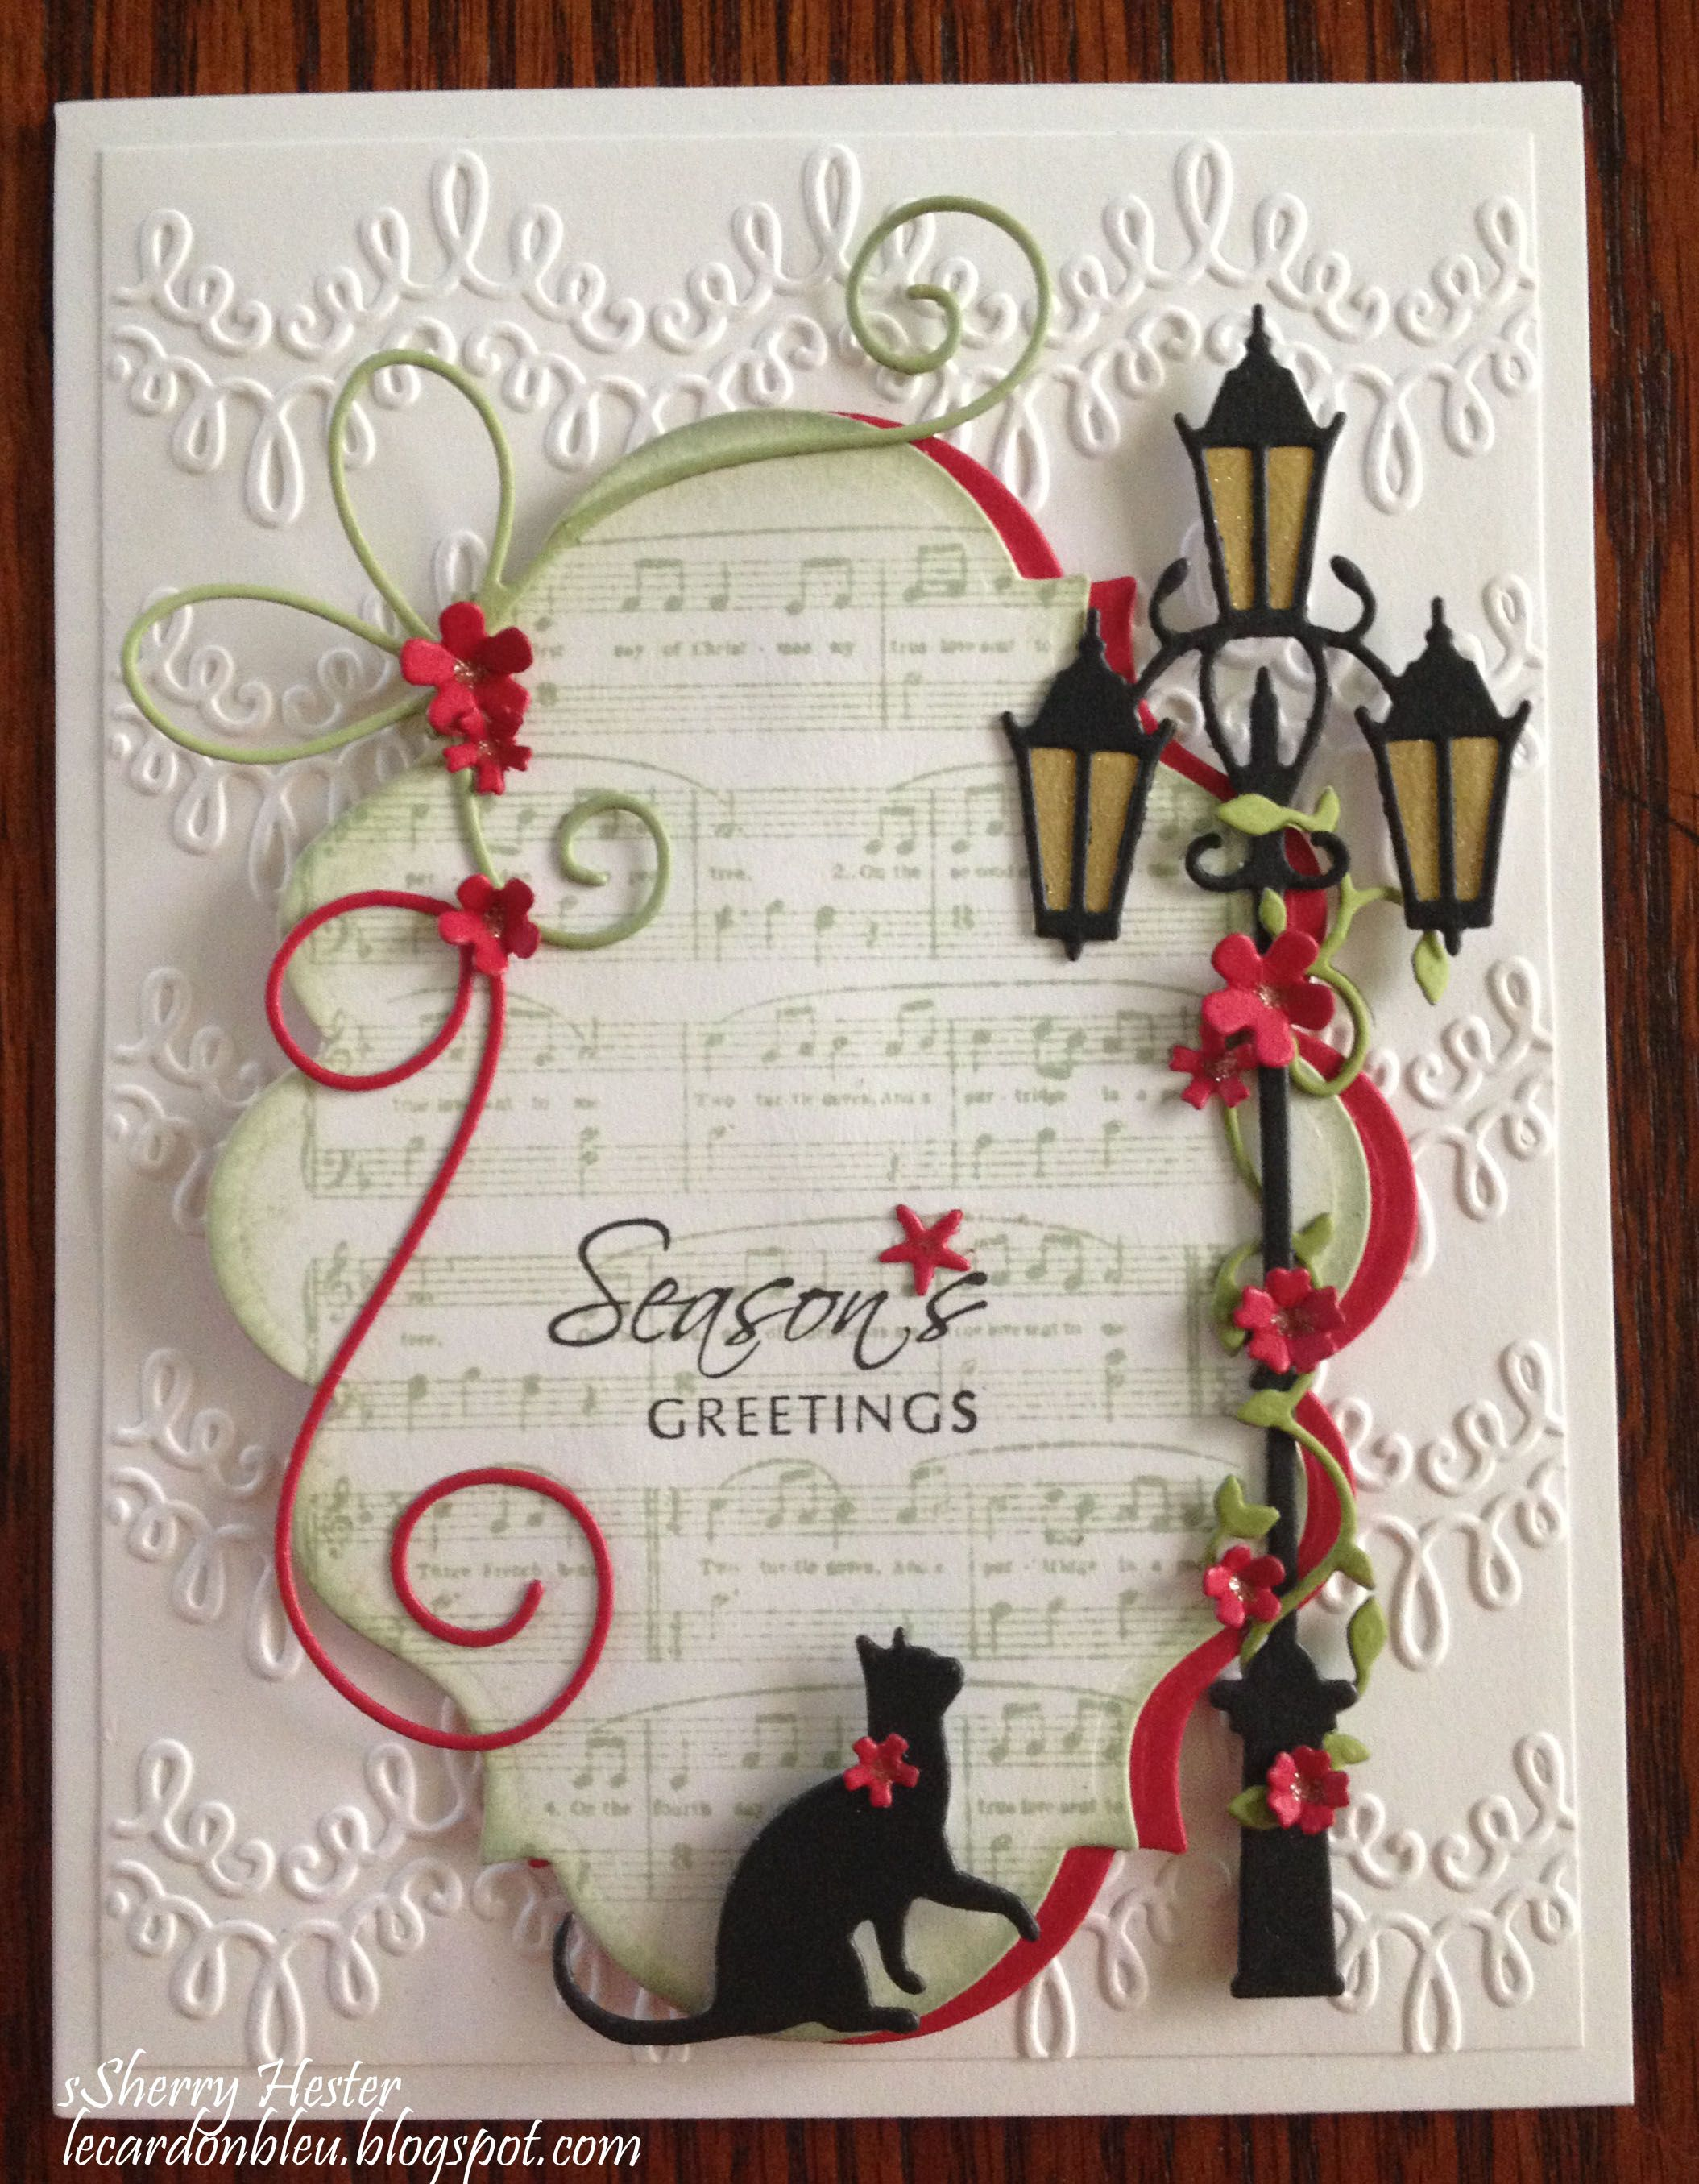 Season's Greetings lamppost Christmas cards handmade